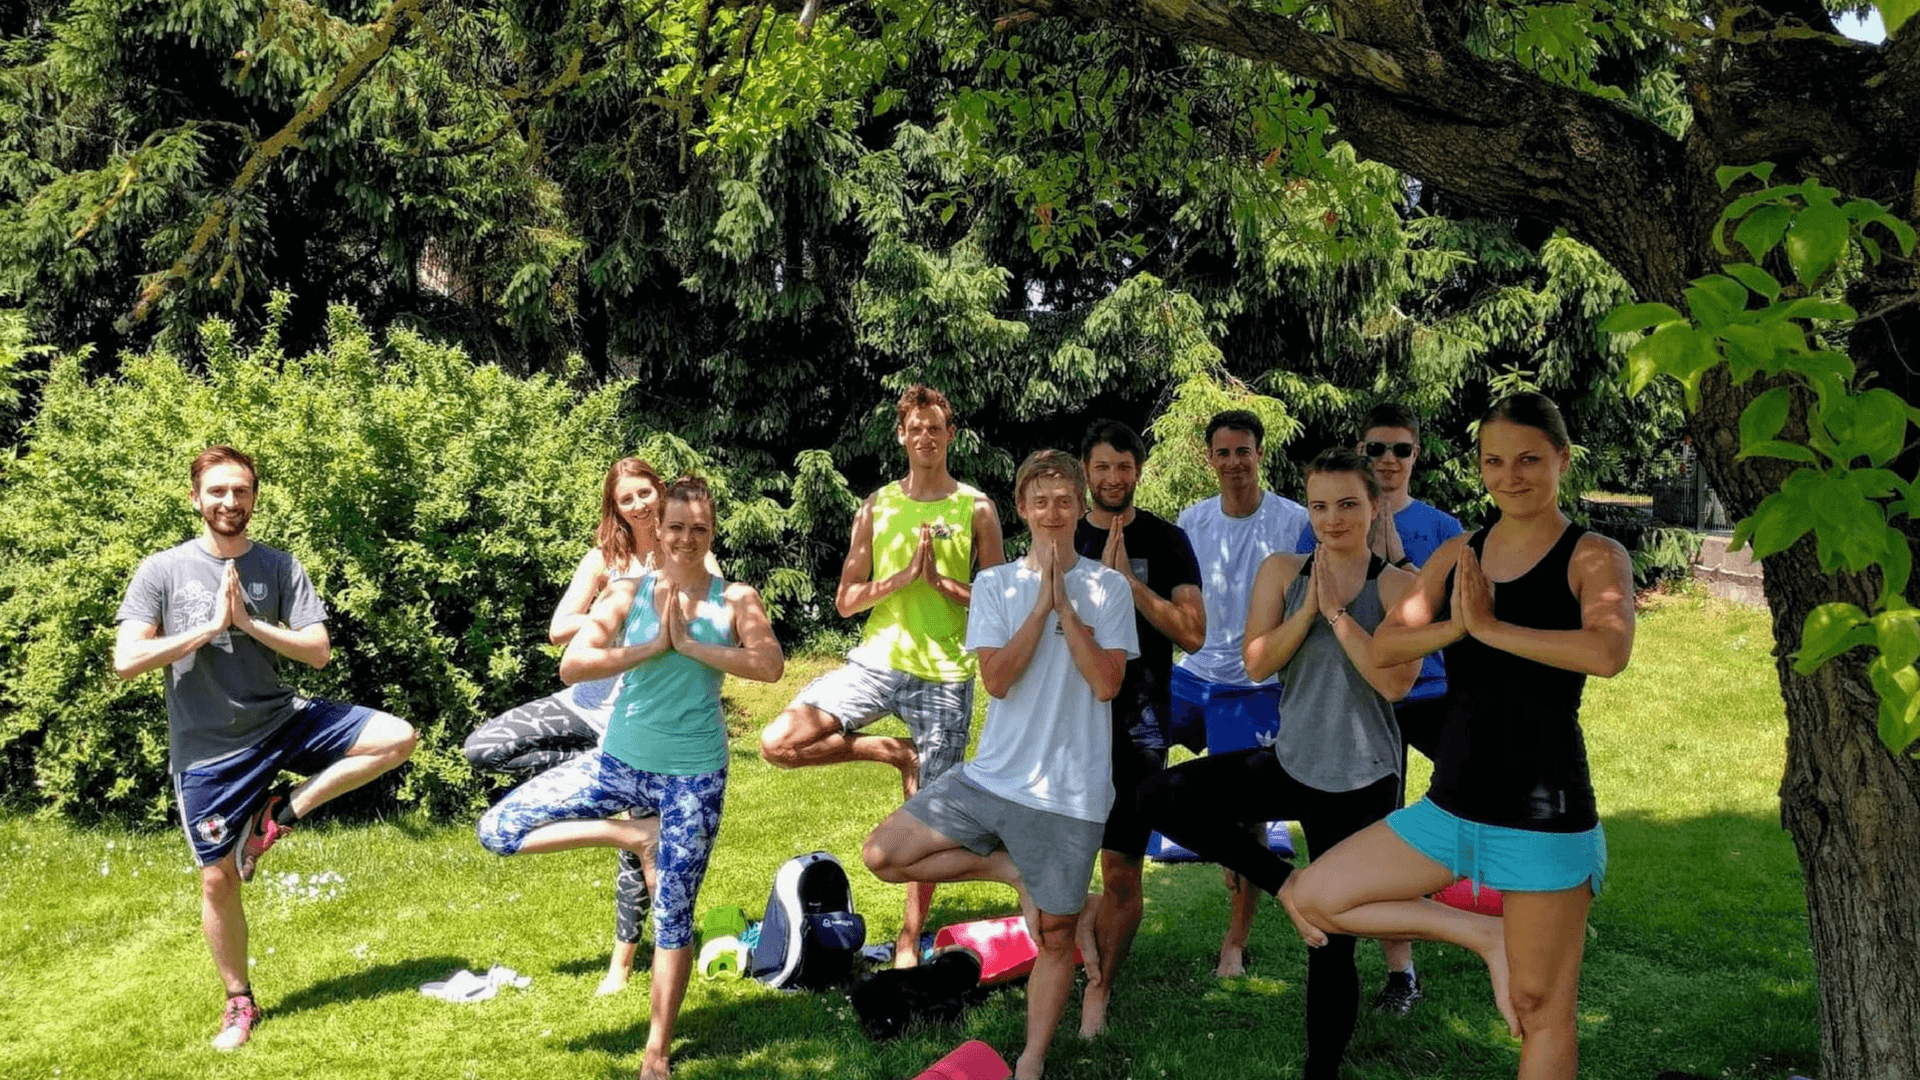 Neue Mitarbeiter nehmen an Yoga Stunde teil